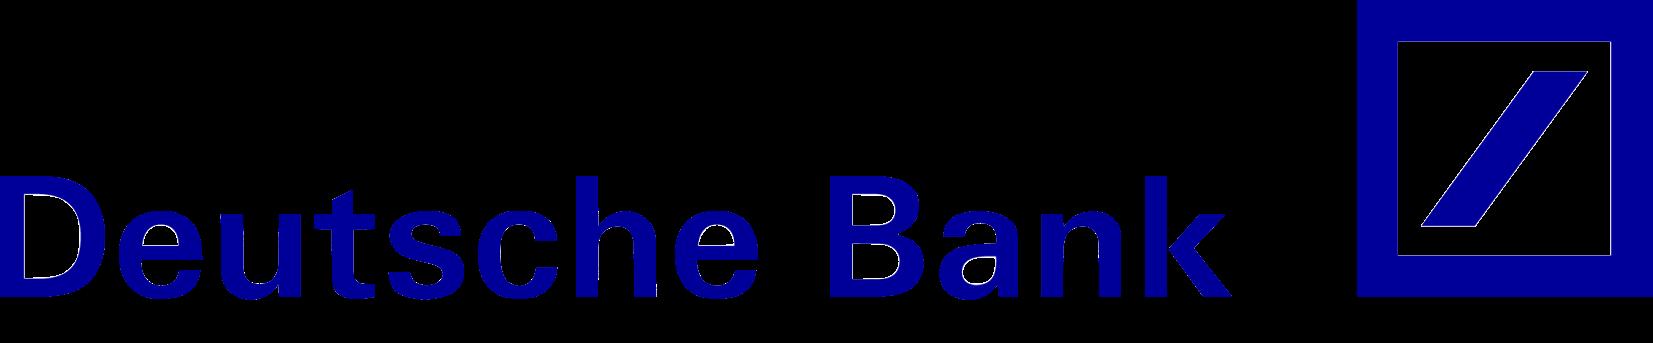 deutsche-bank transparent.png